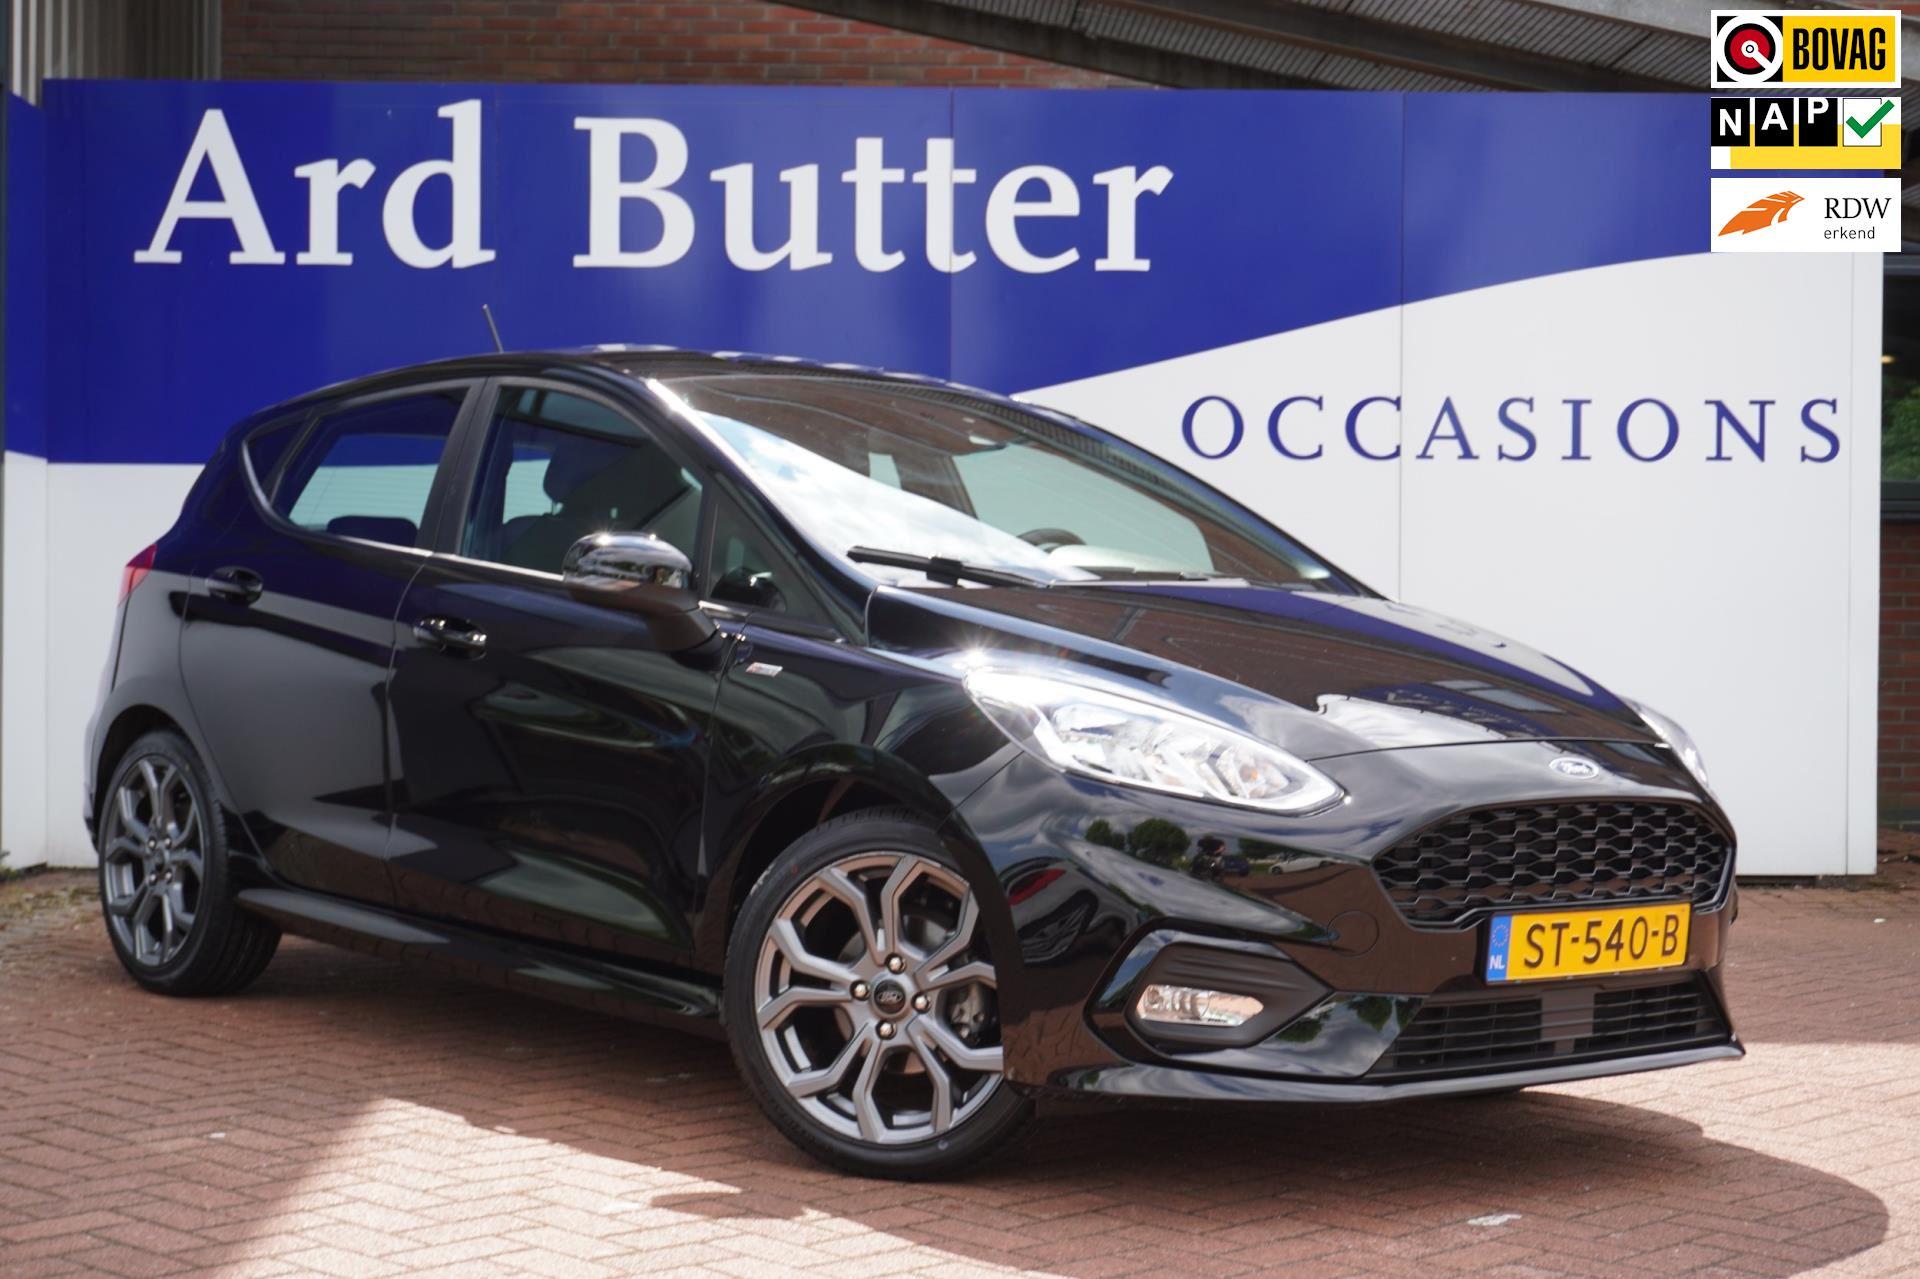 Ford Fiesta occasion - Autobedrijf Ard Butter B.V.